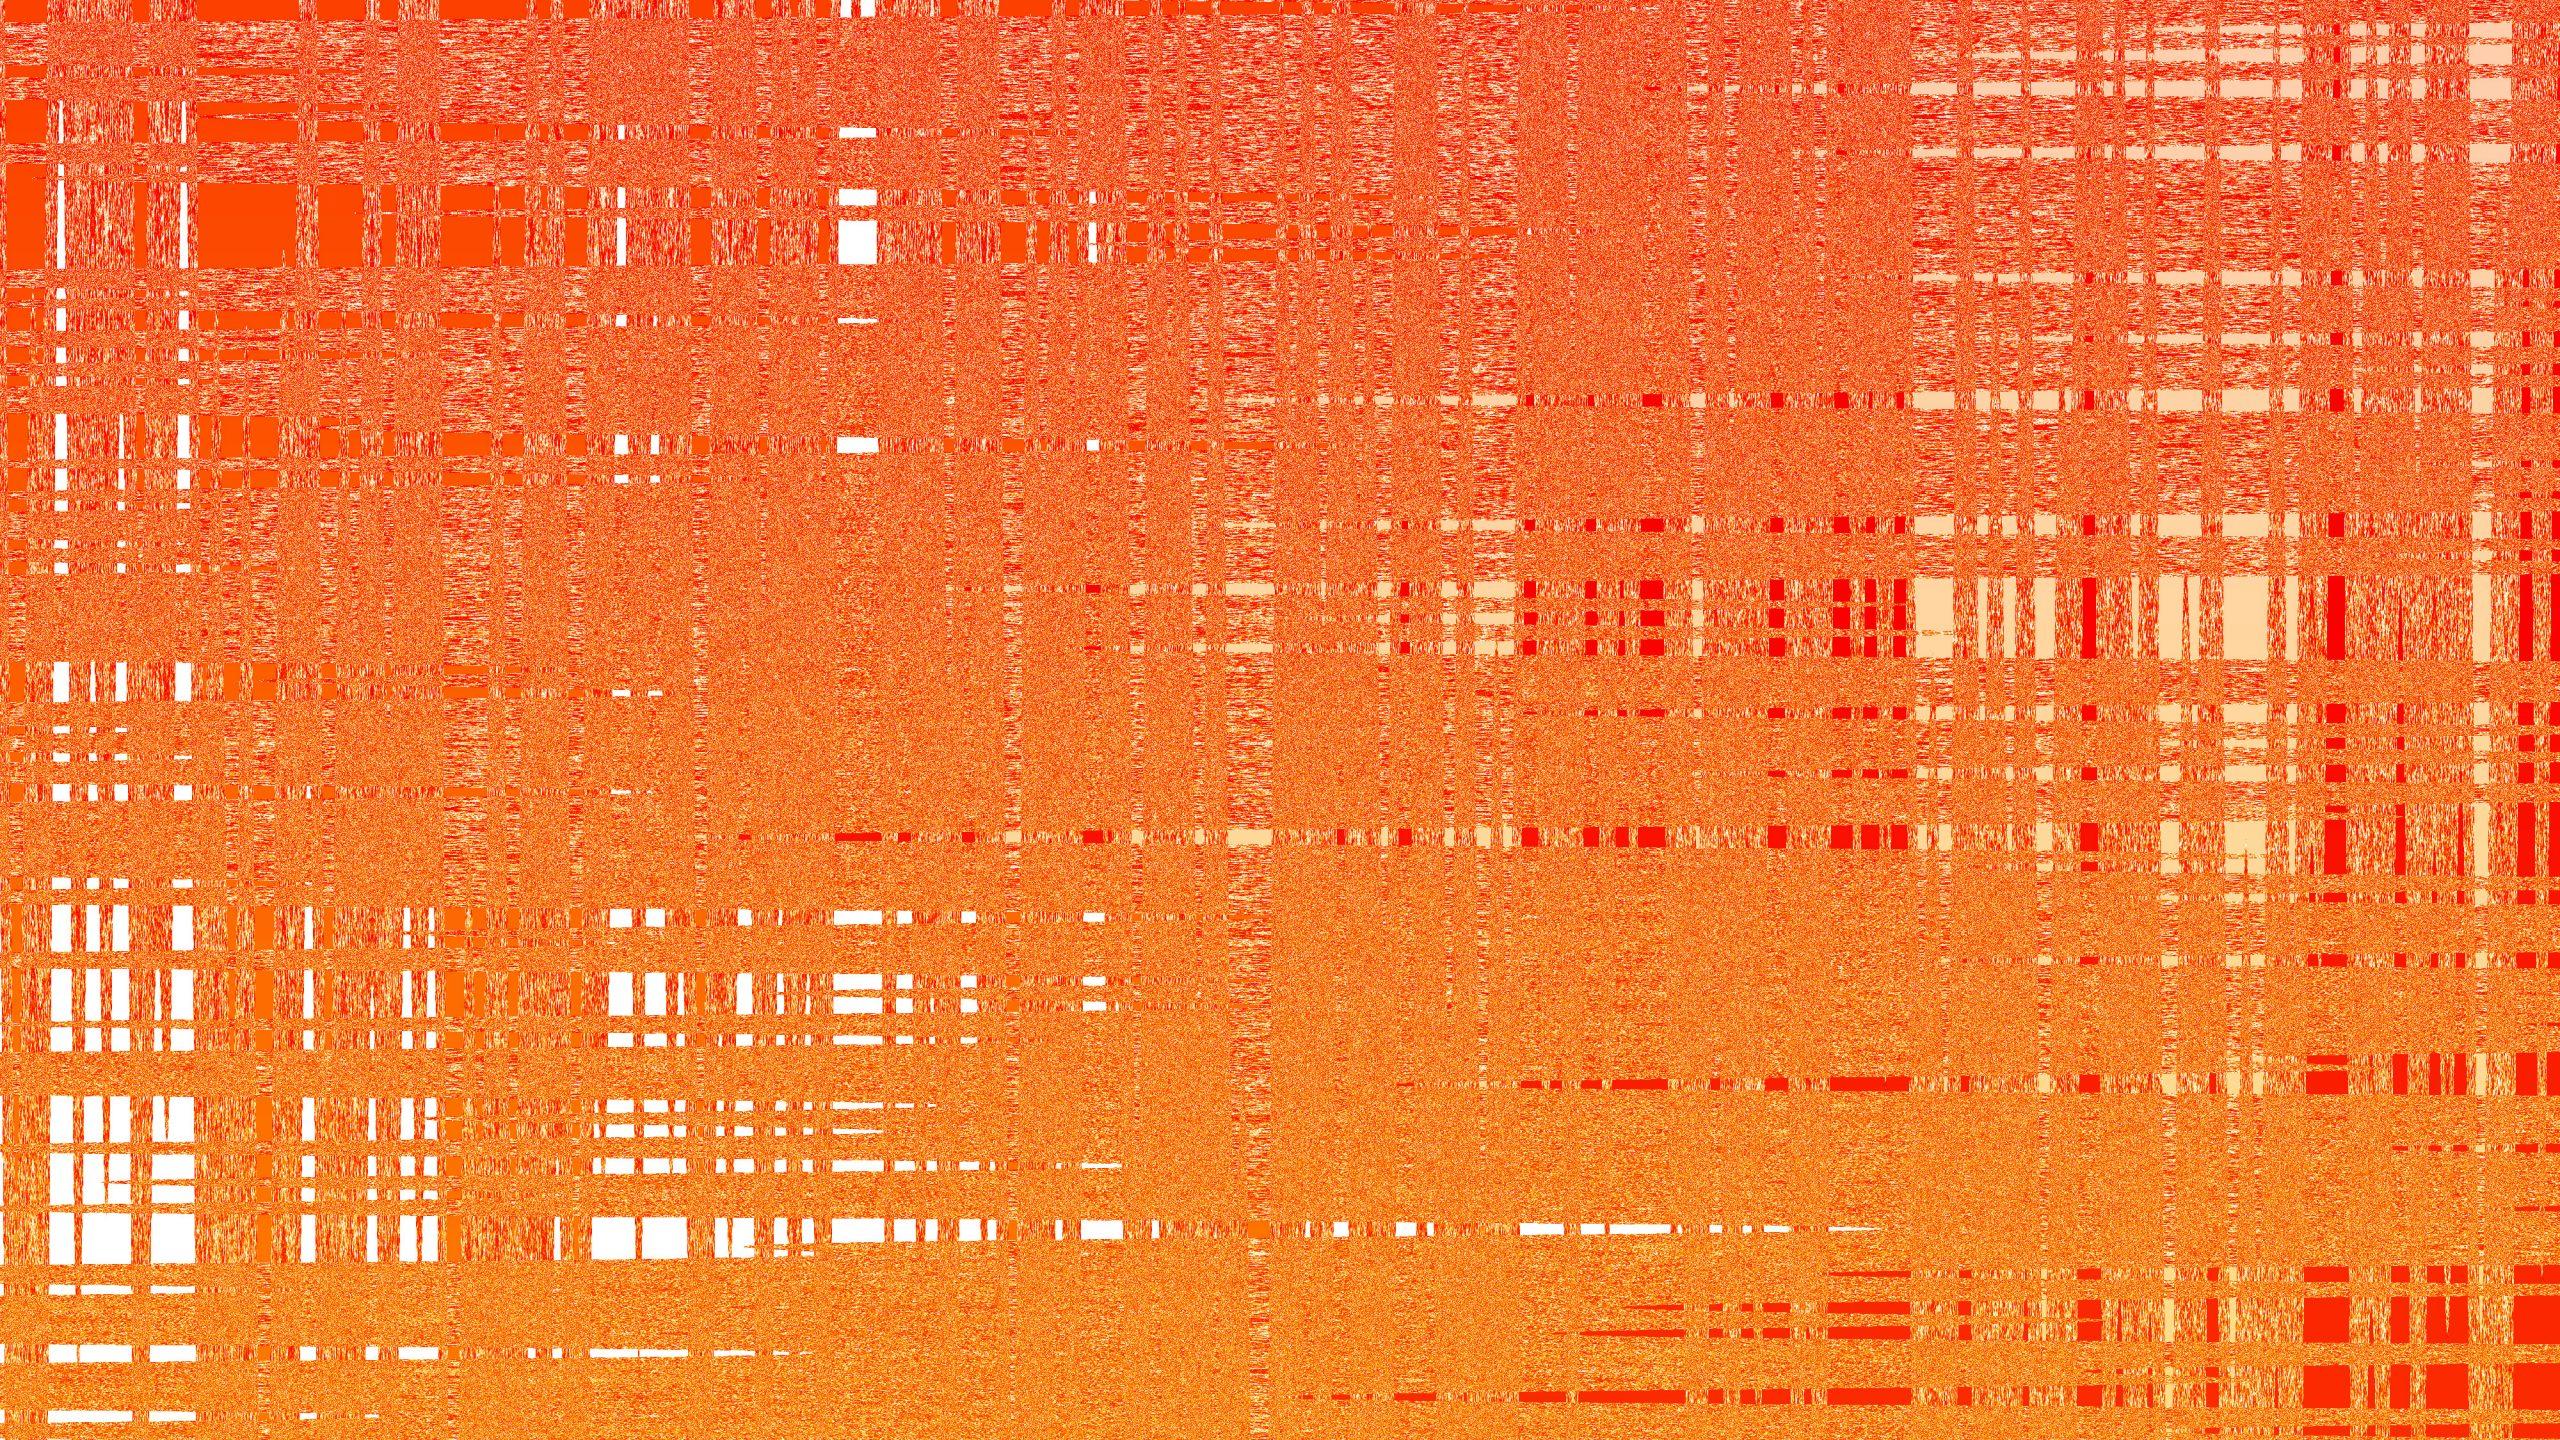 orange-texture-background